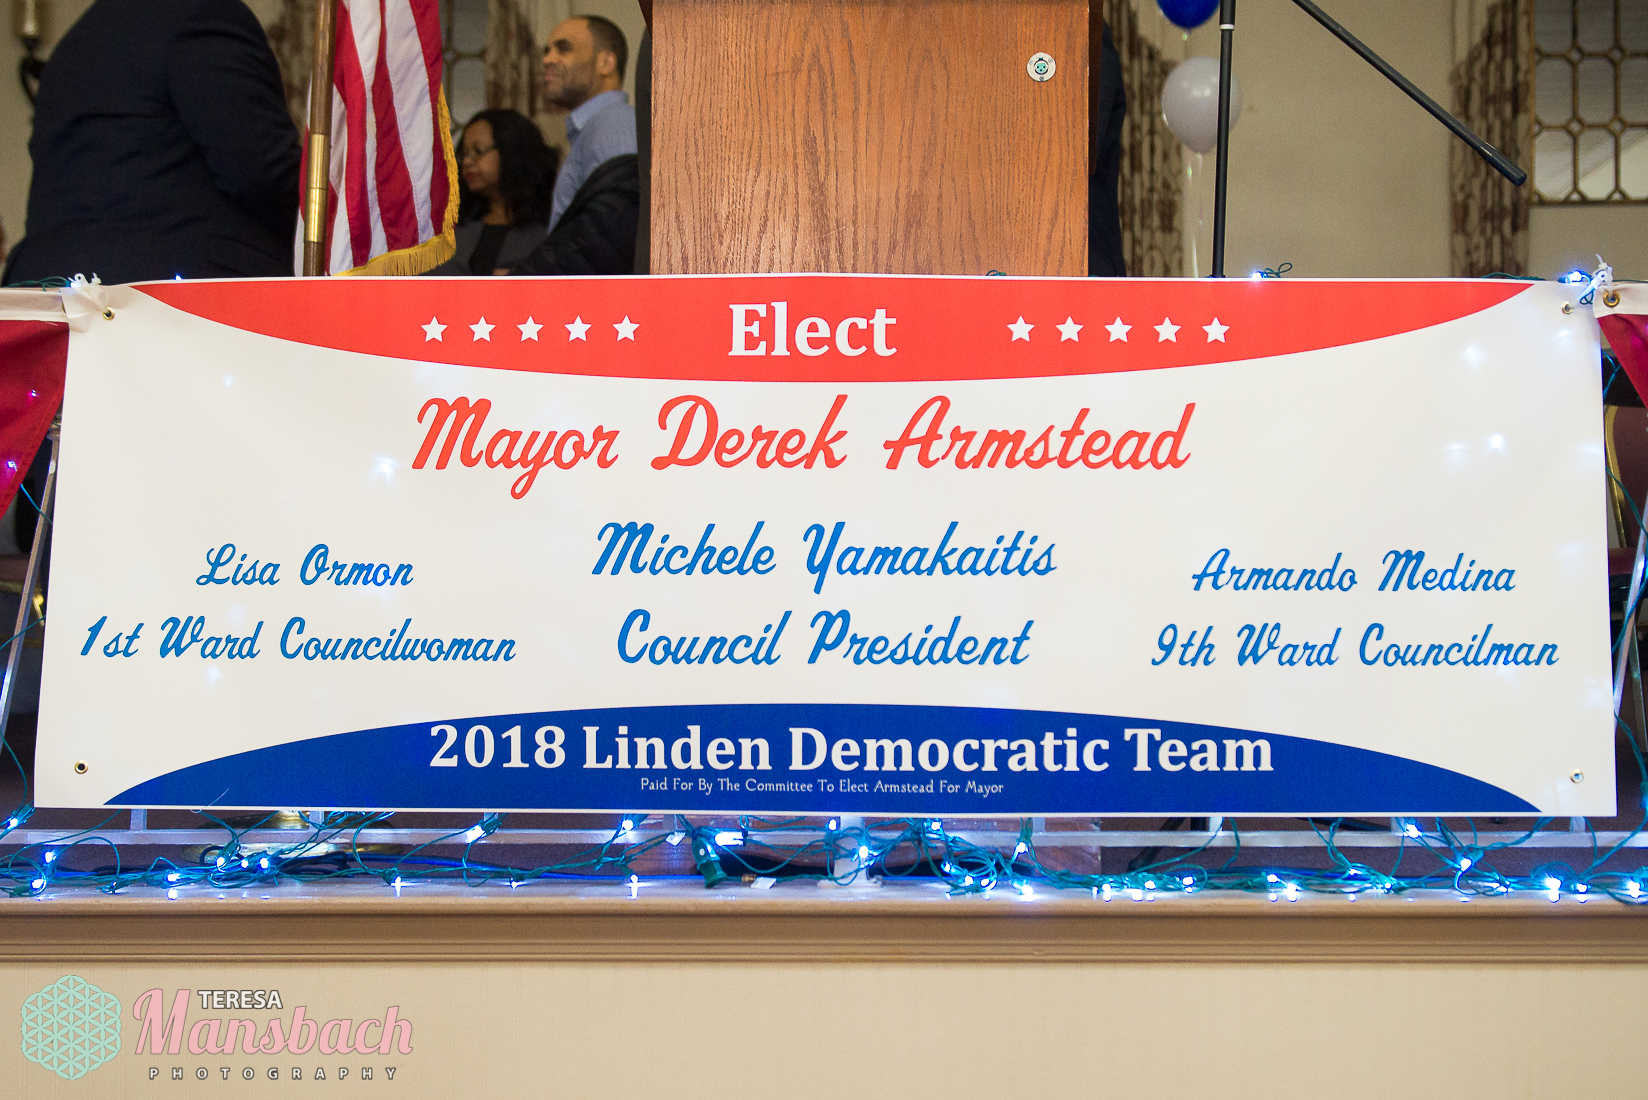 Nunos-linden-nj-Newjersey-Democrats-DNC-0113.jpg